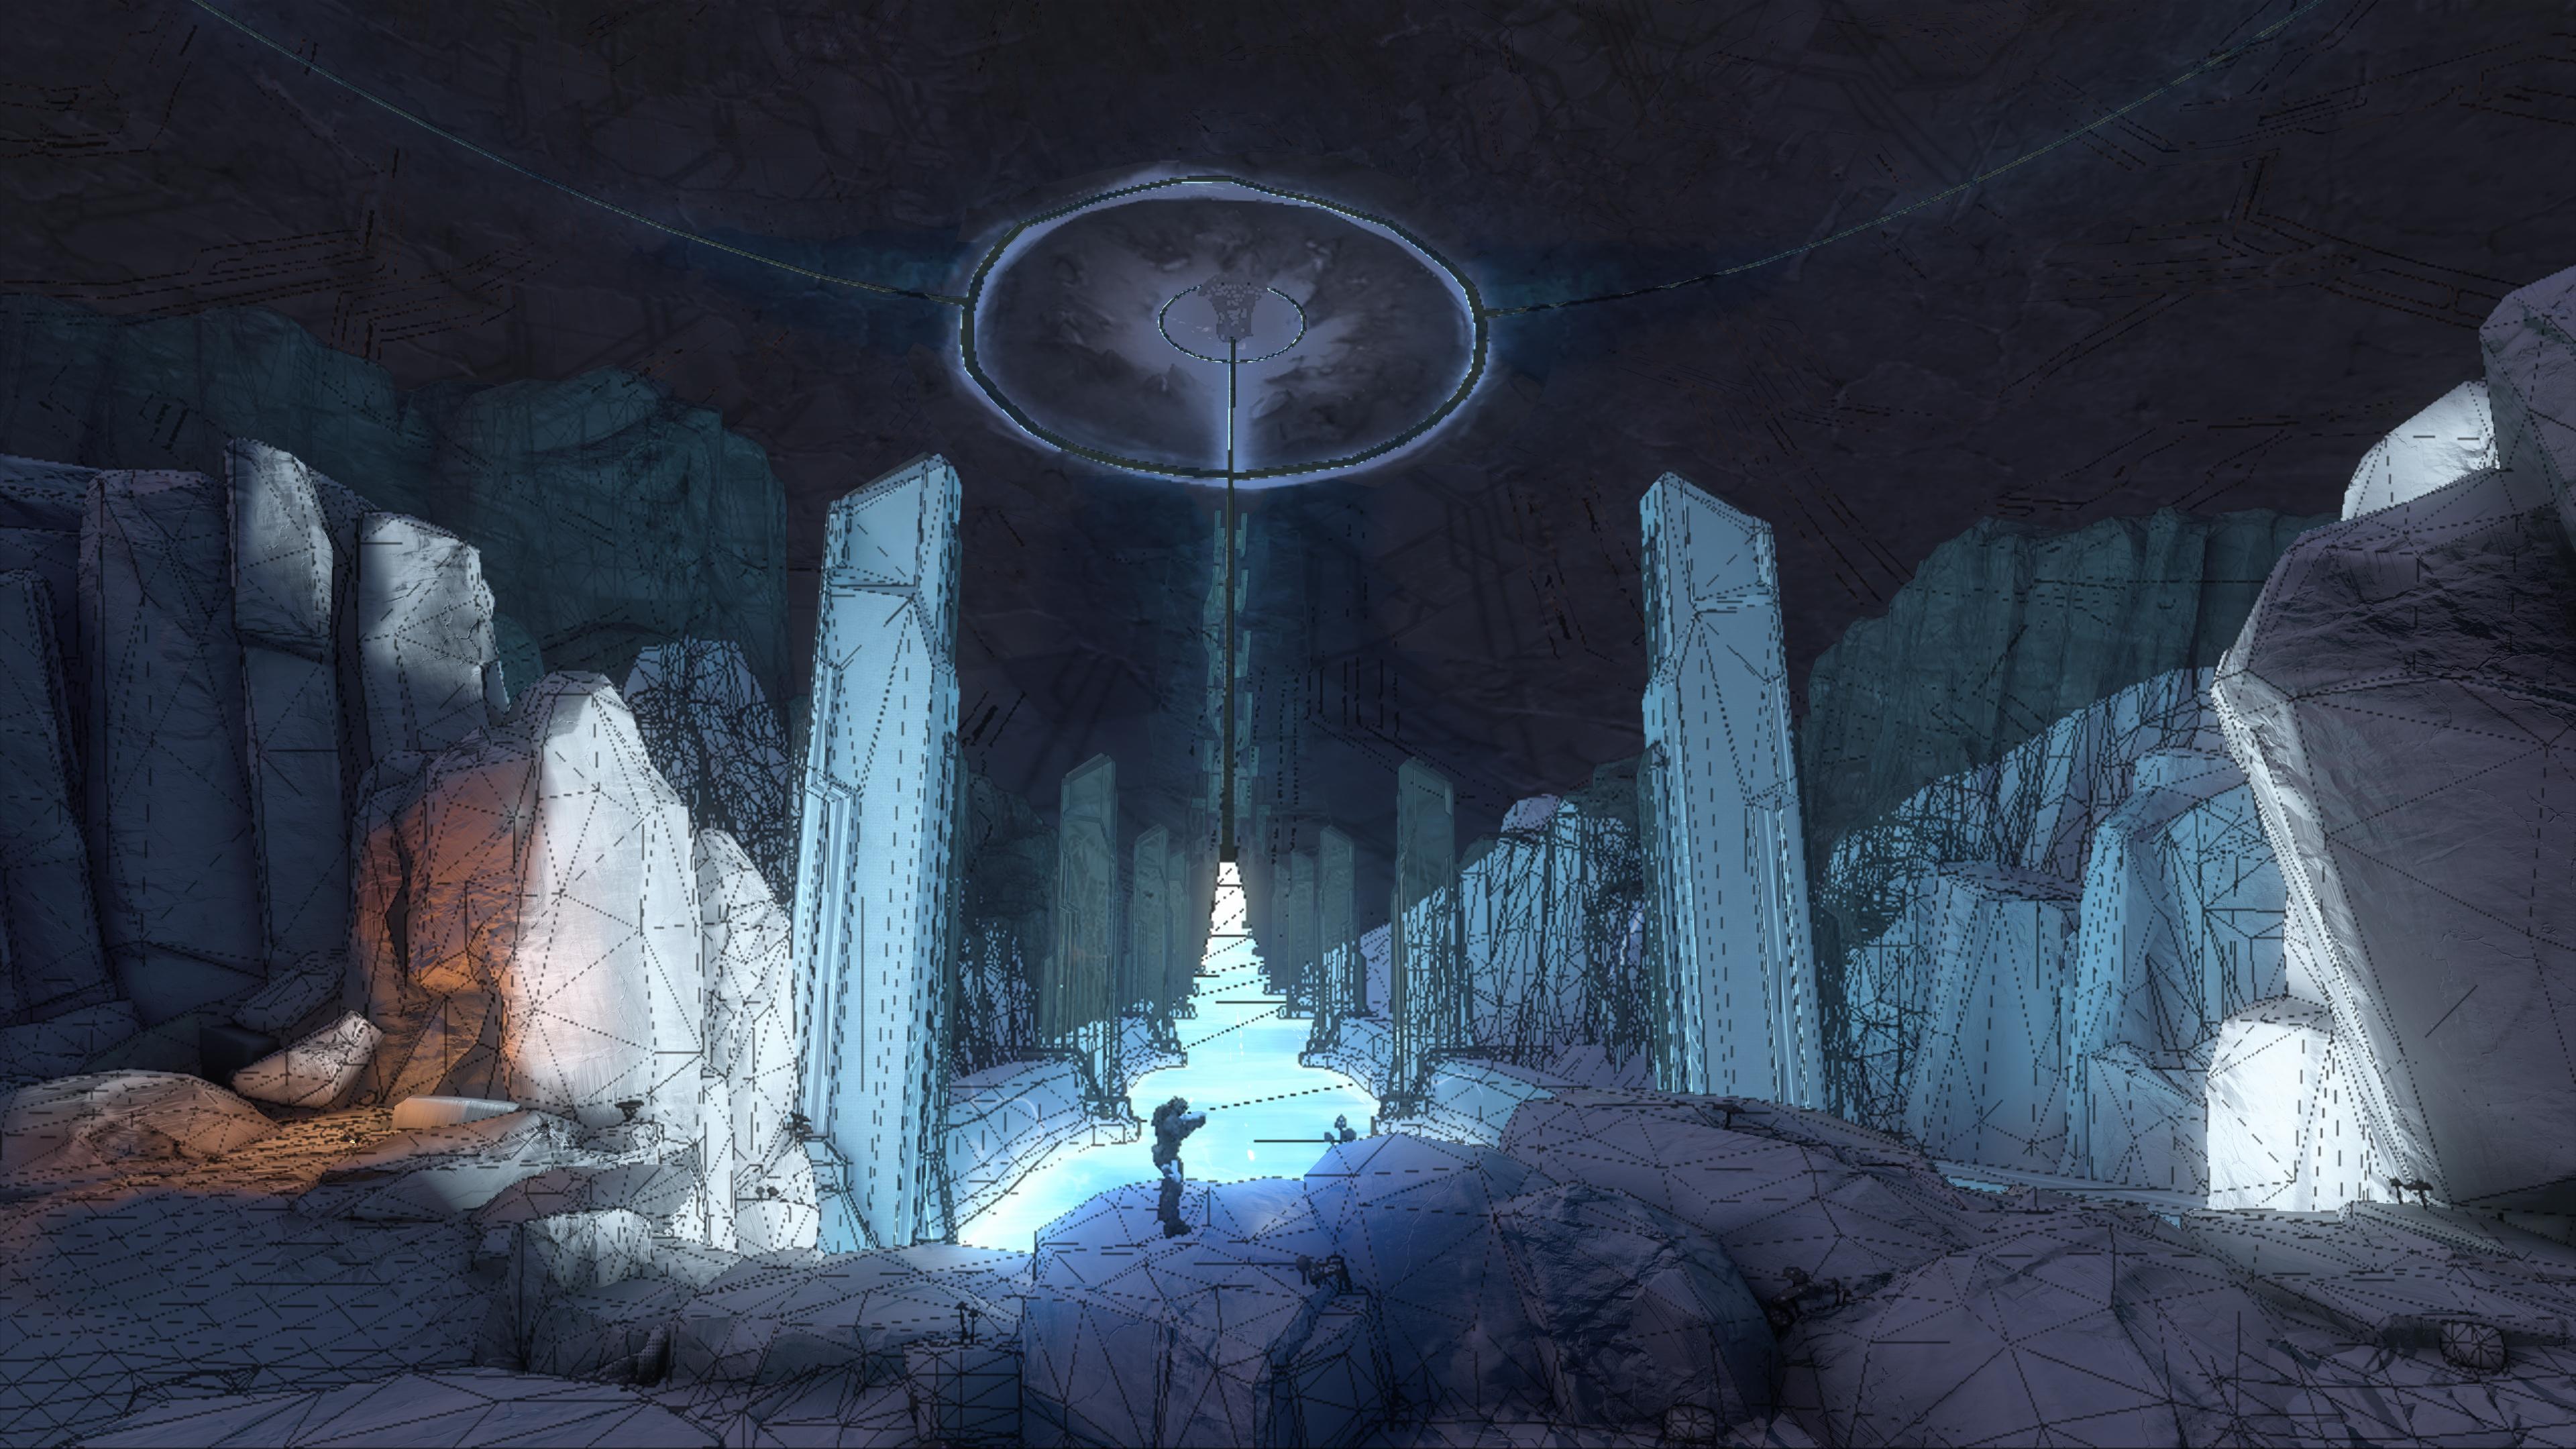 caves023AOWF